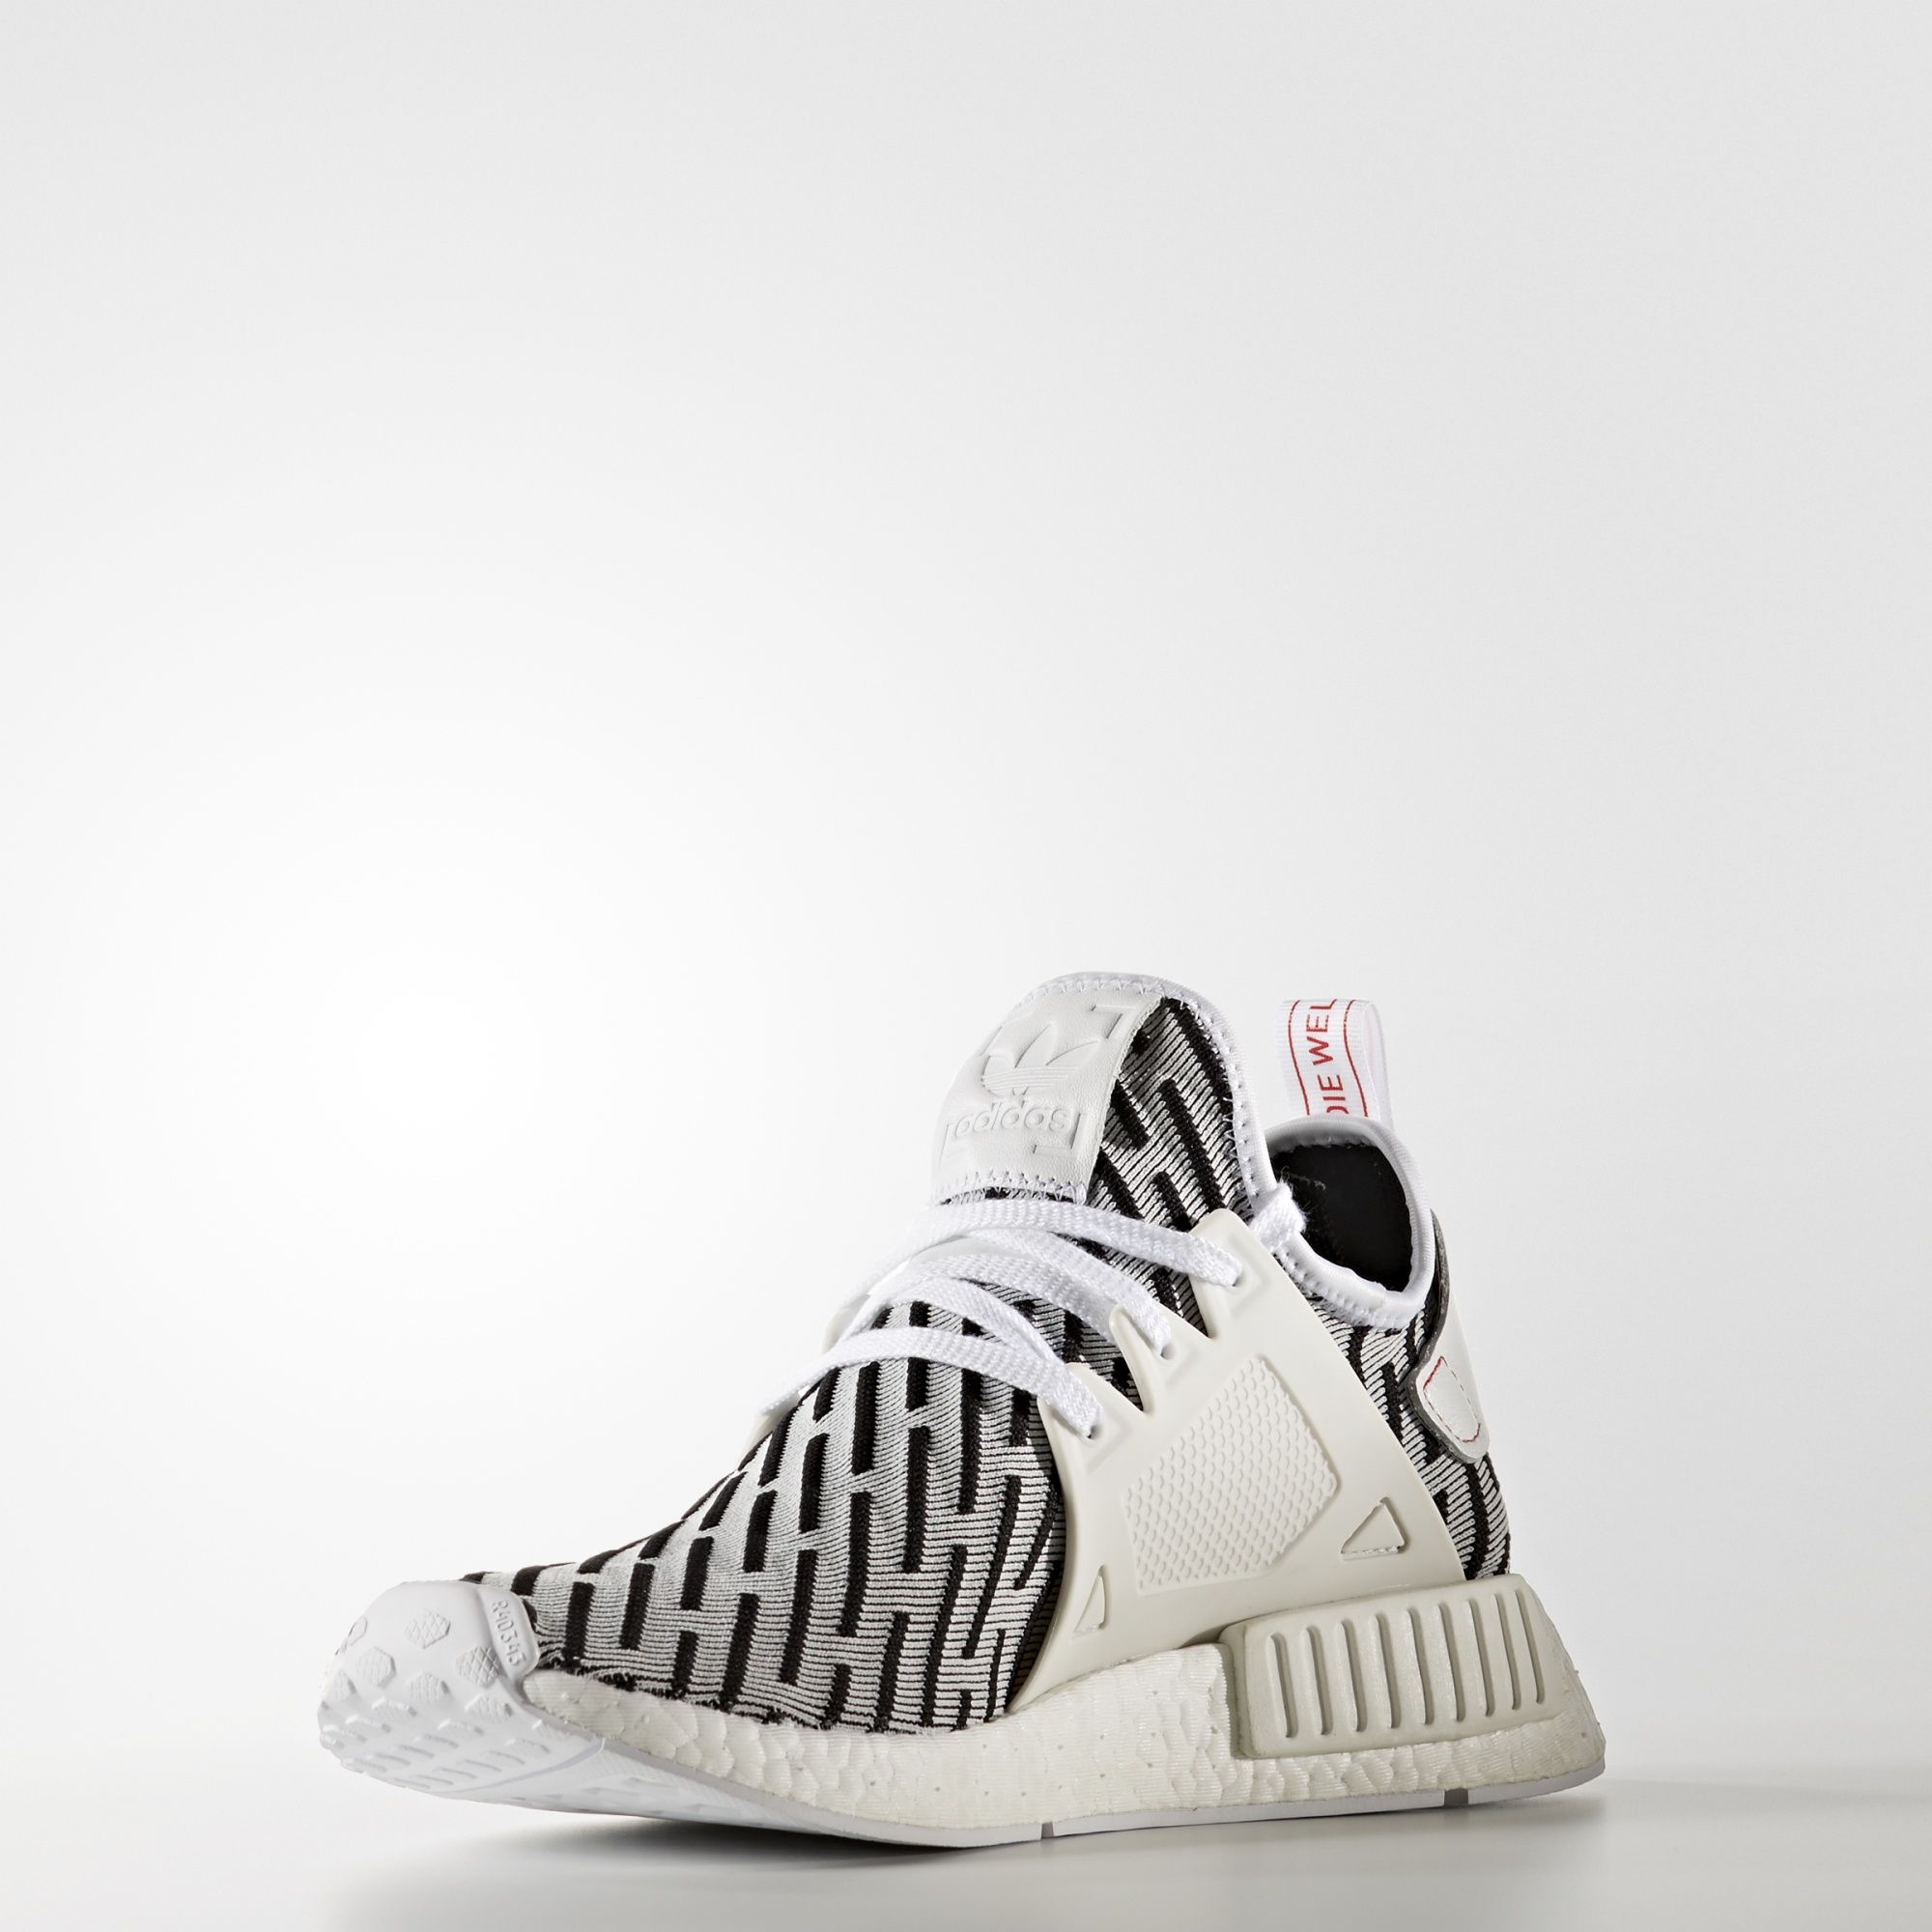 adidas NMD XR1 Primeknit Zebra BB2911 2